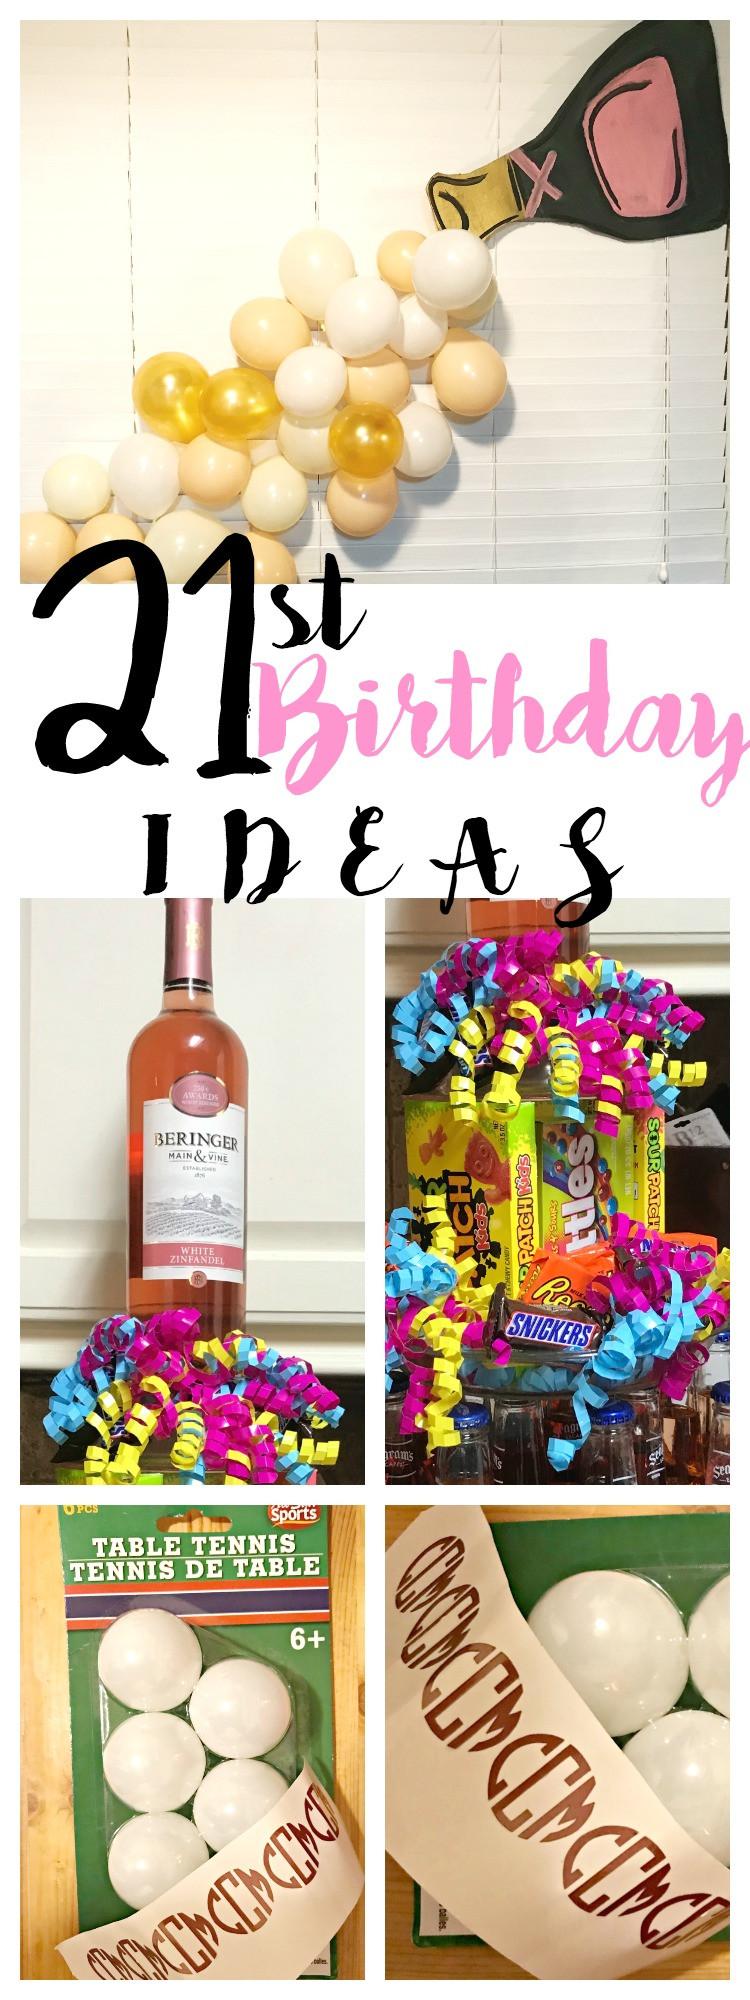 21st Birthday Decorations  21st Birthday Party Ideas